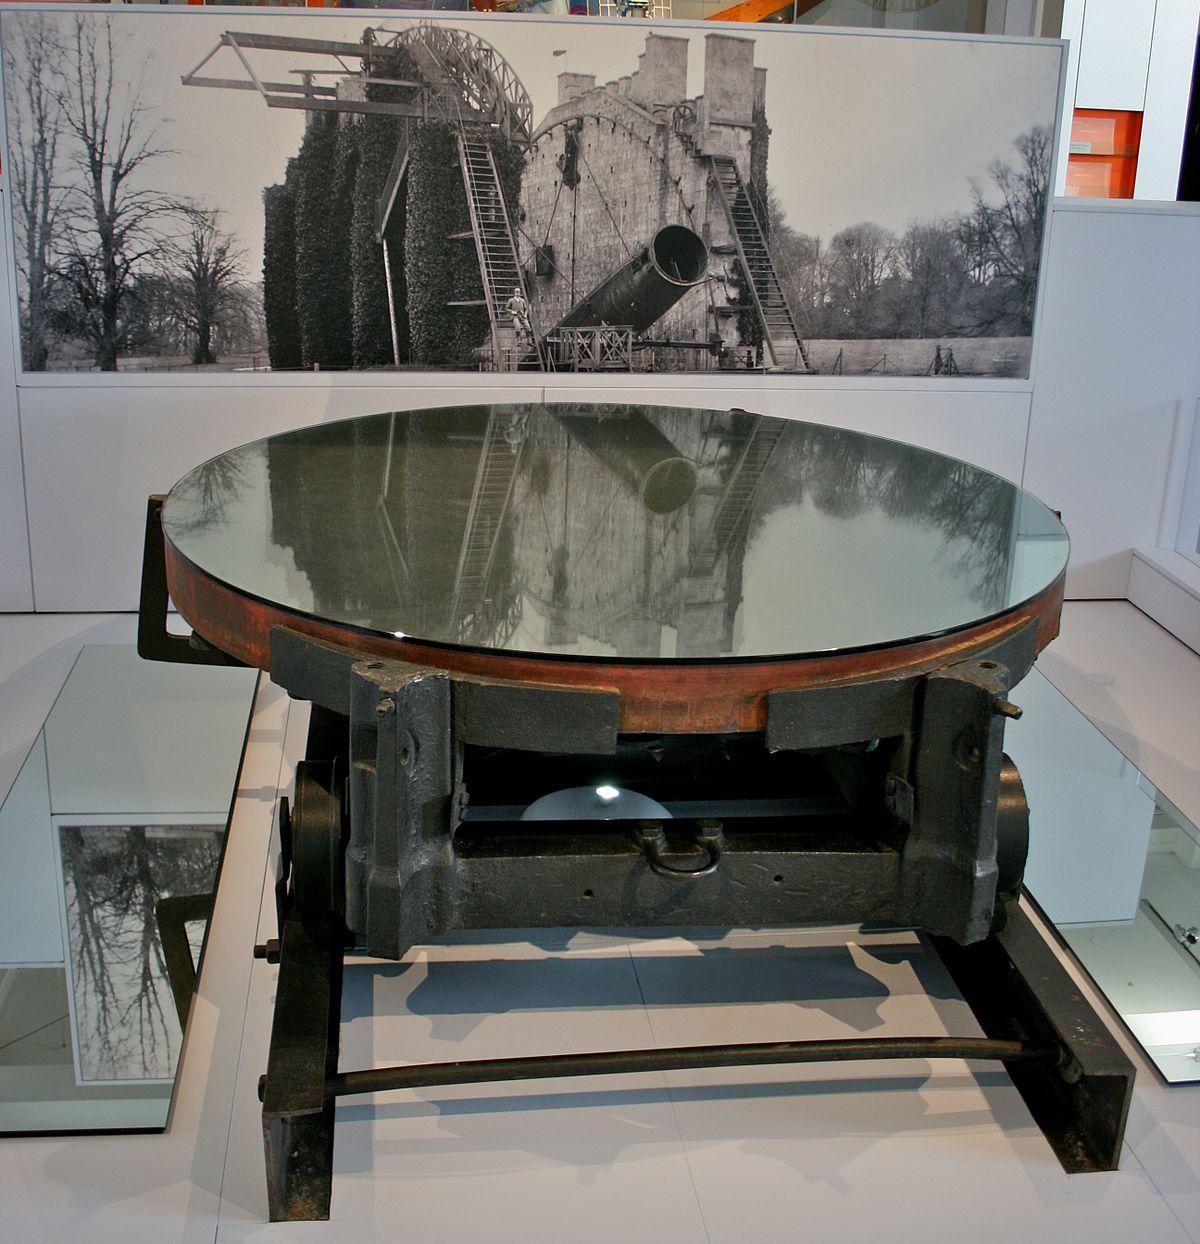 miroir optique wikip dia On miroir telescope